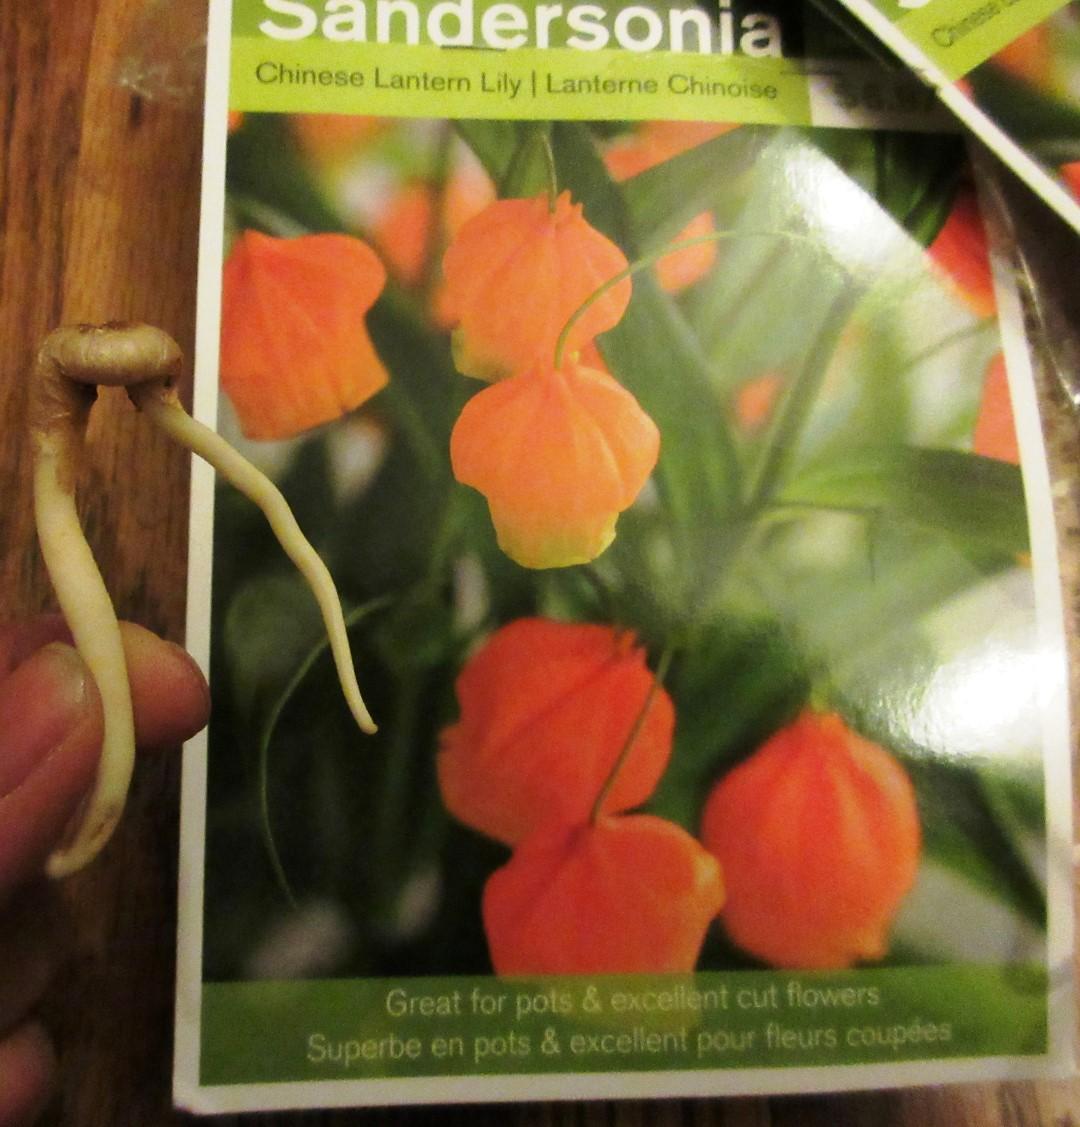 Chinese Lily Lantern or Christmas Bells (Sandersonia aurantiaca ) 宮燈百合   My Food And Flowers